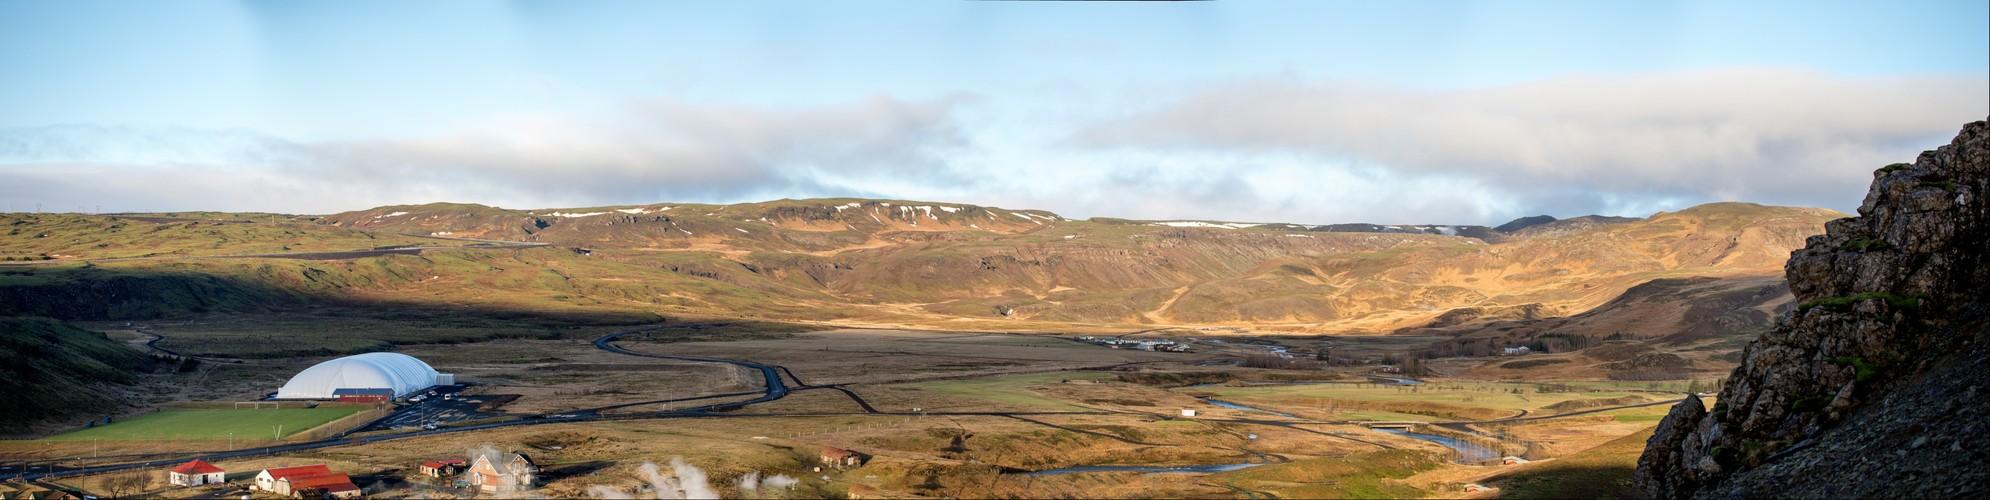 Iceland - Feb 2017 - Panorama 18